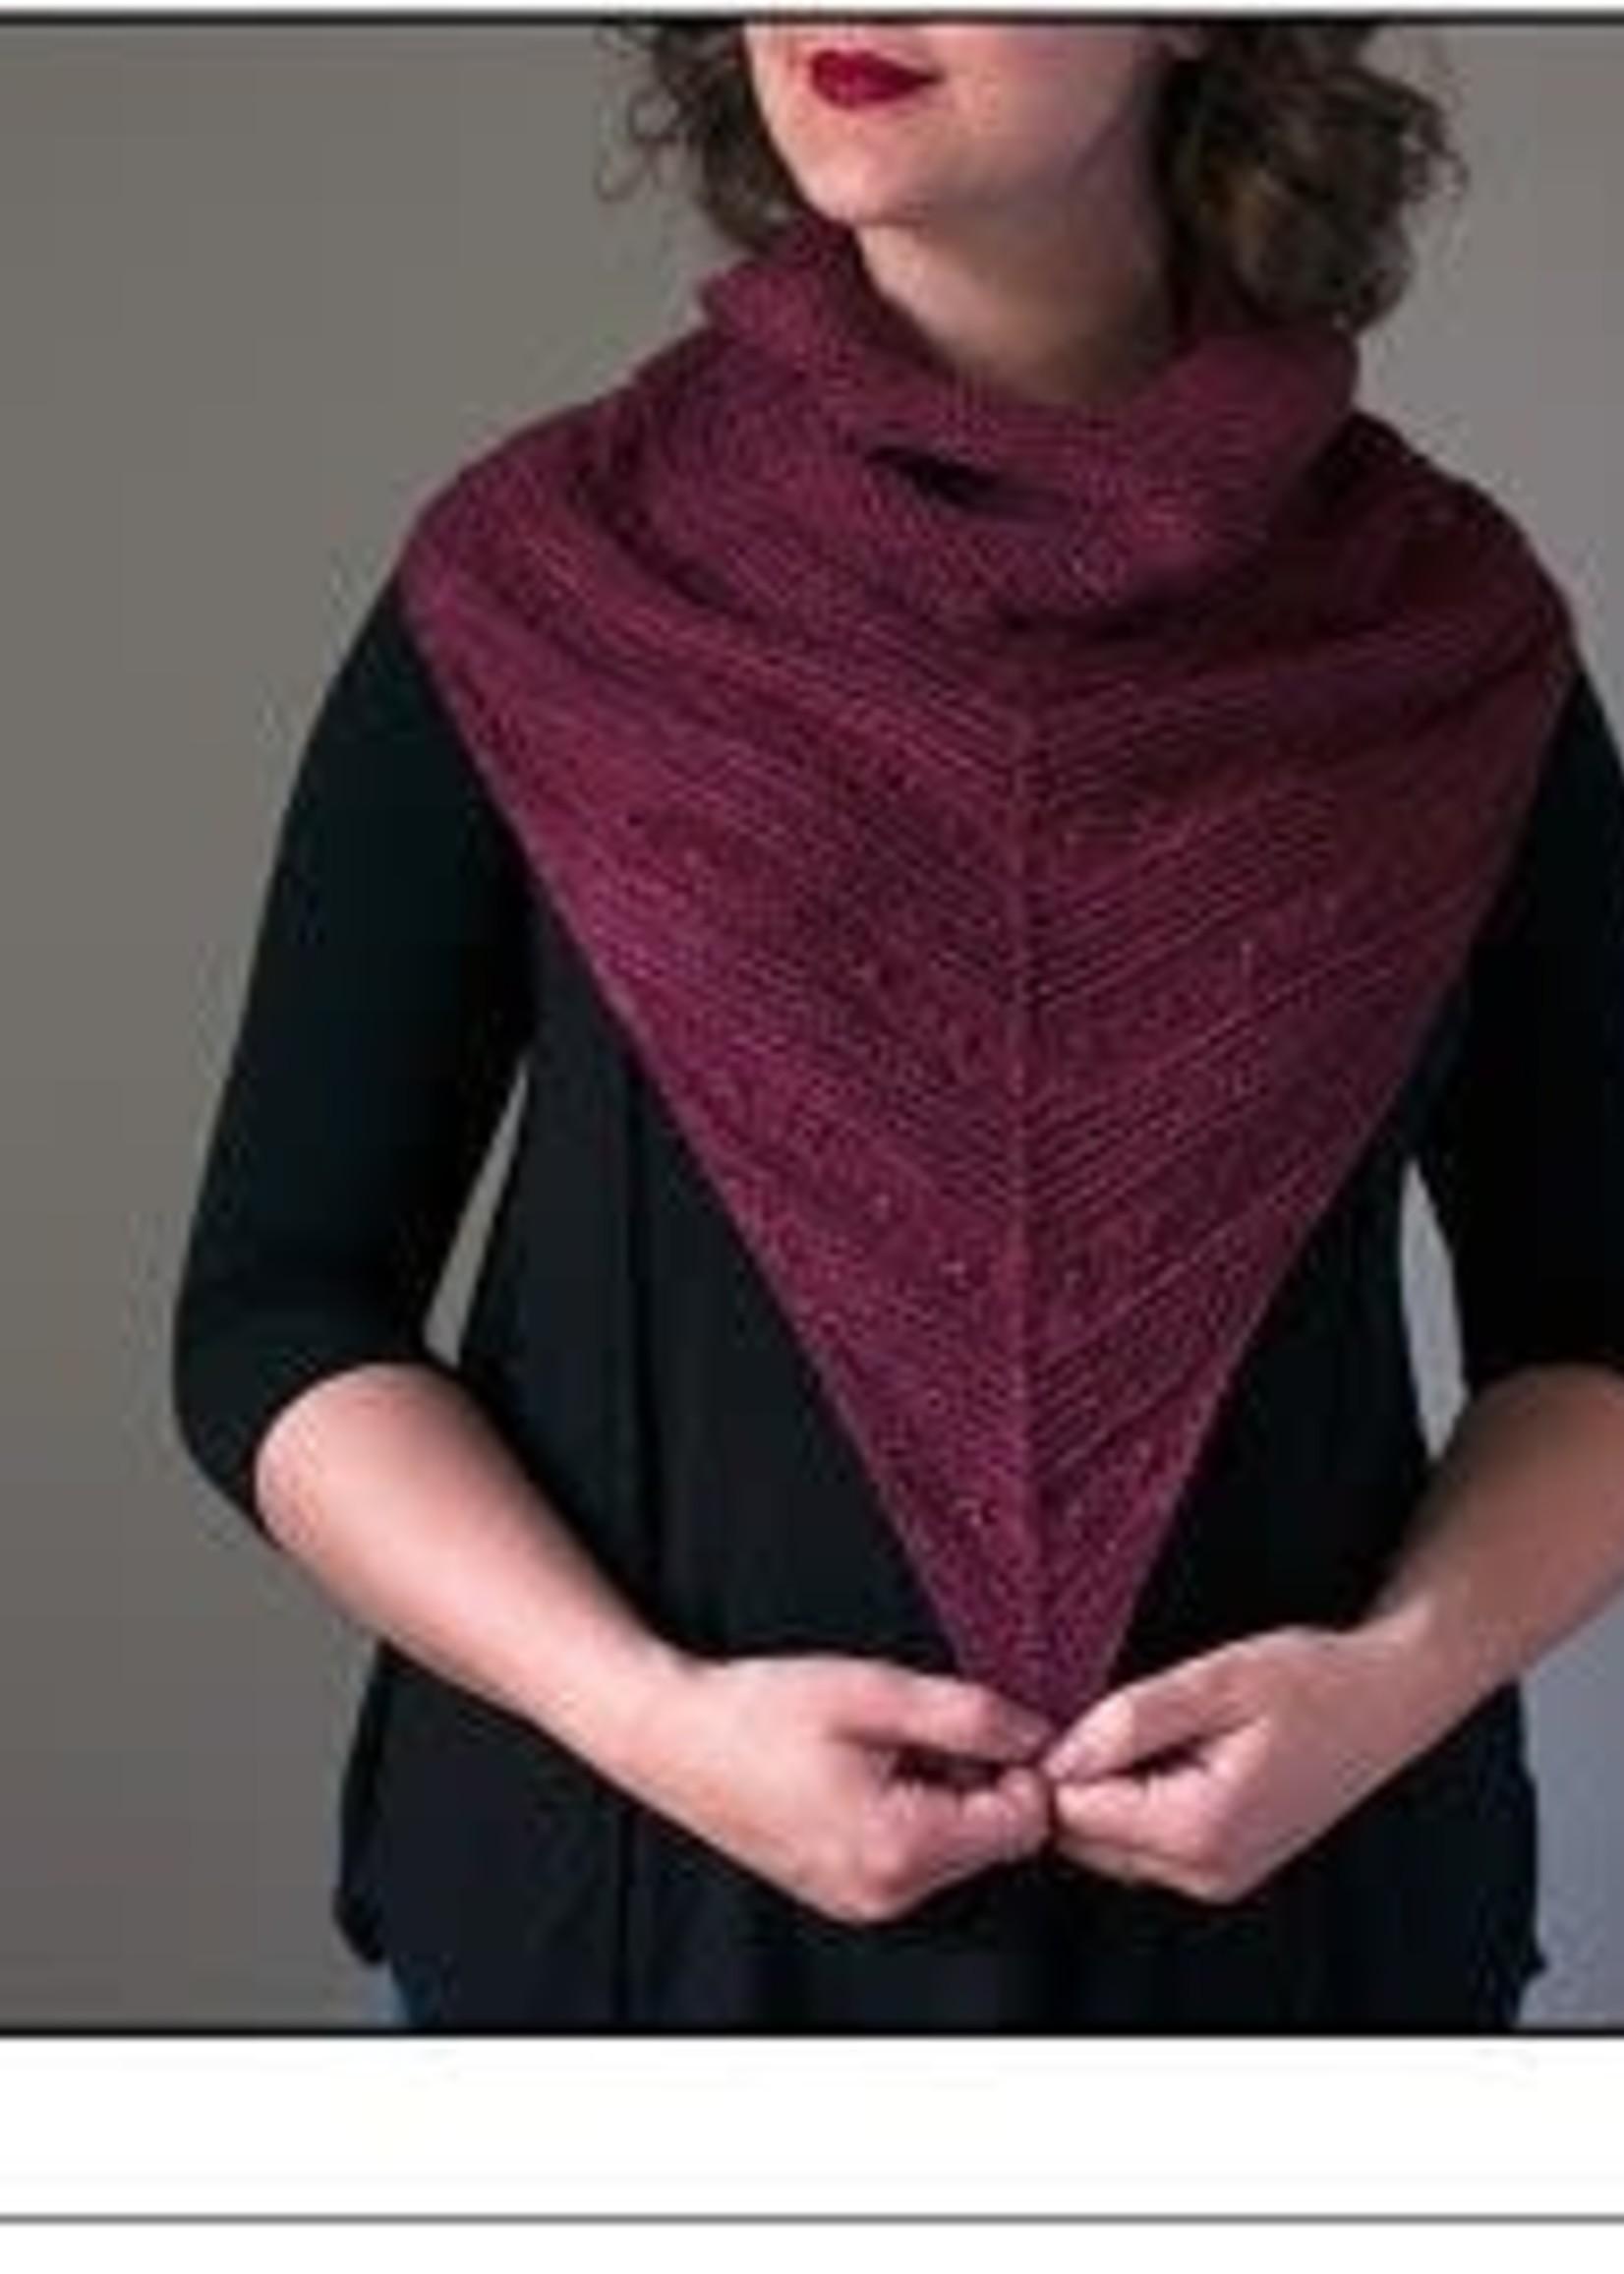 Knox Mountain Knit Co. Knox Mountain Knit Co. - Granby Cowl